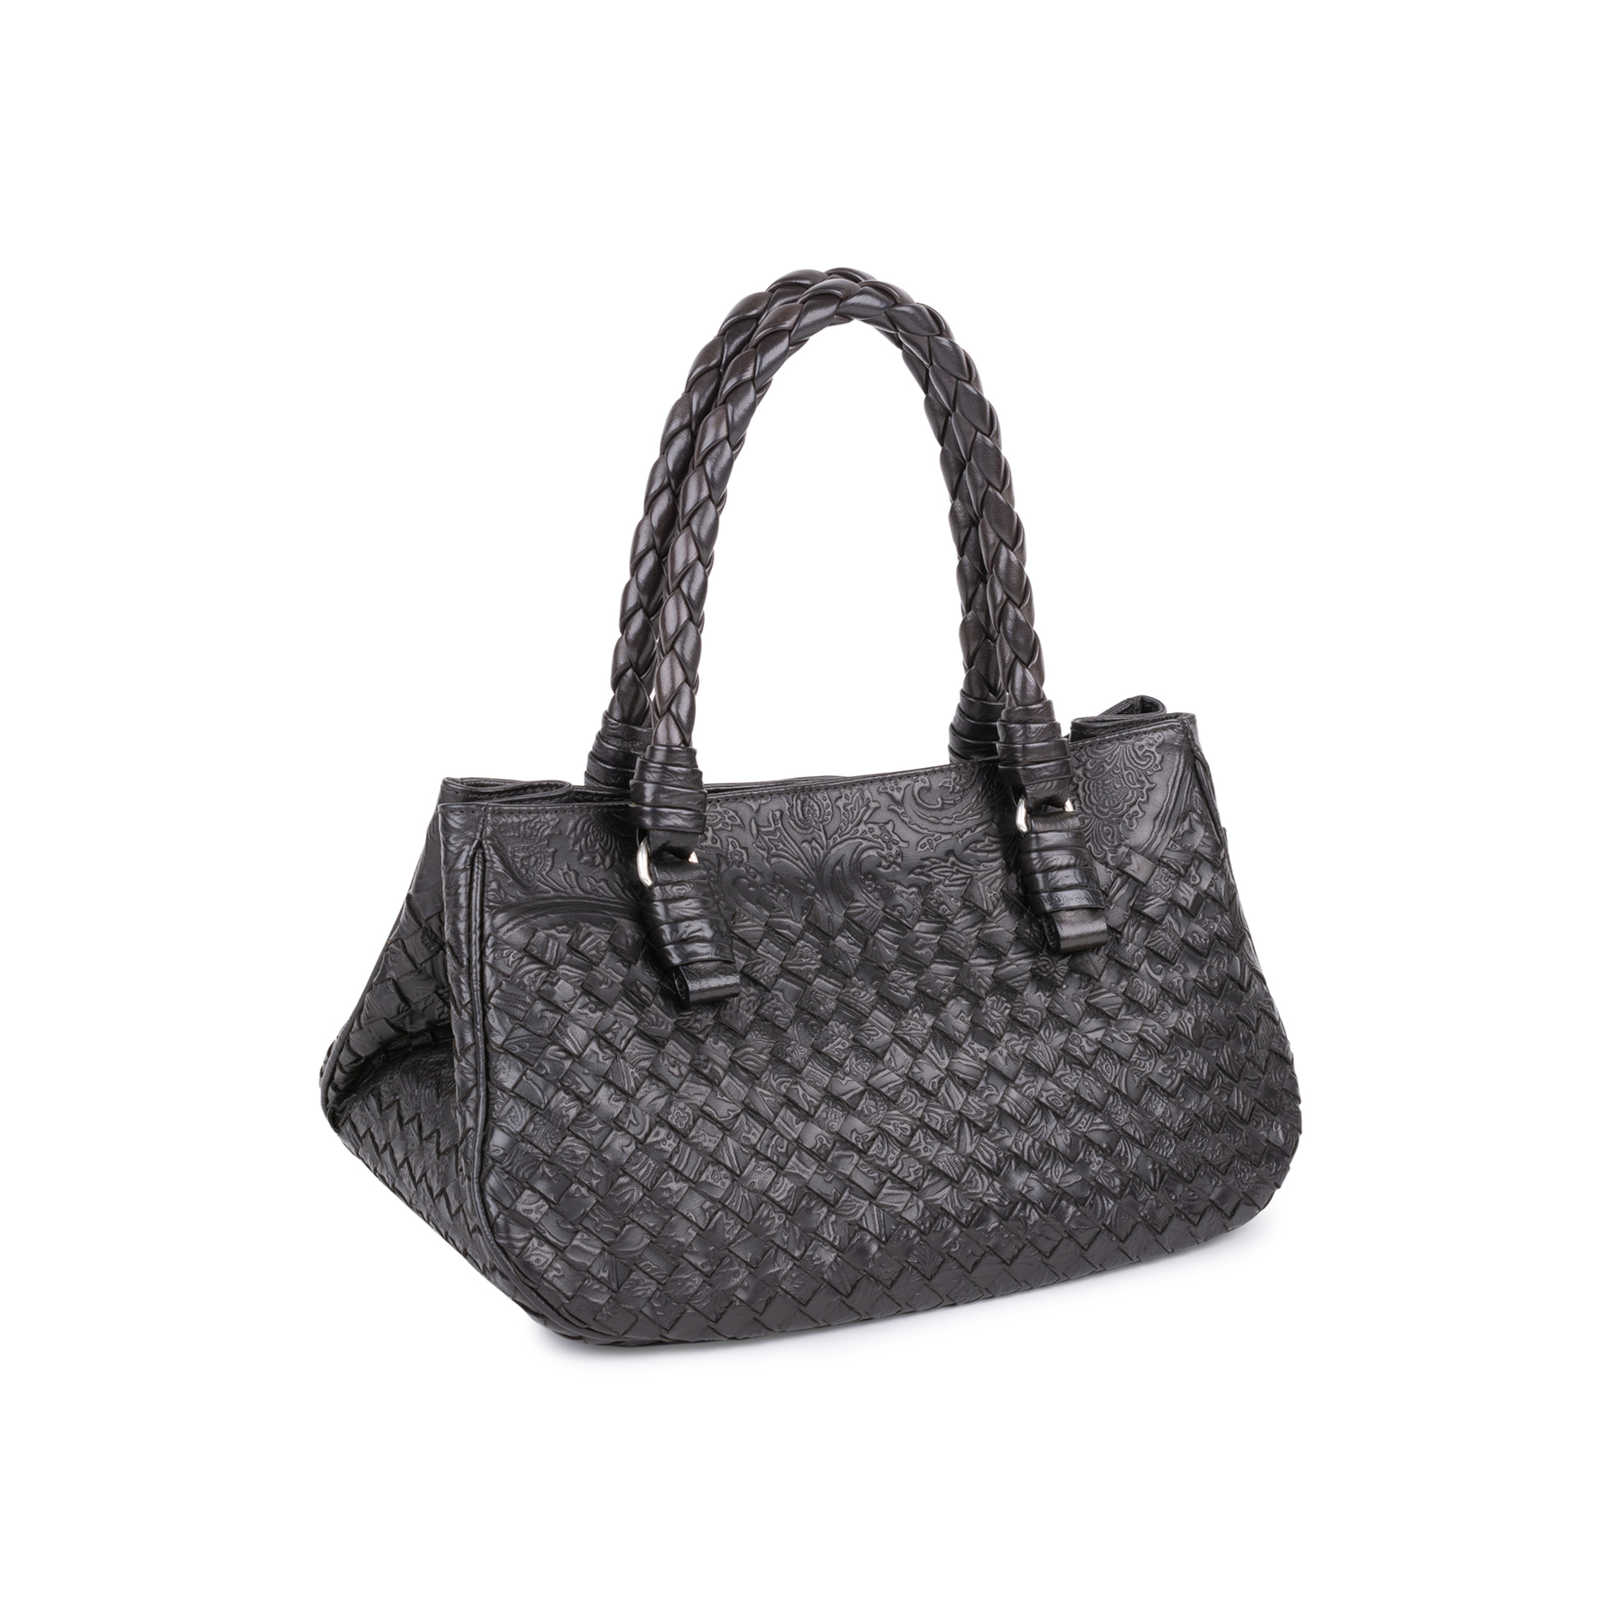 a73f350c50d ... Authentic Pre Owned Bottega Veneta Embossed Intrecciato Leather Tote Bag  (PSS-594-00003 ...